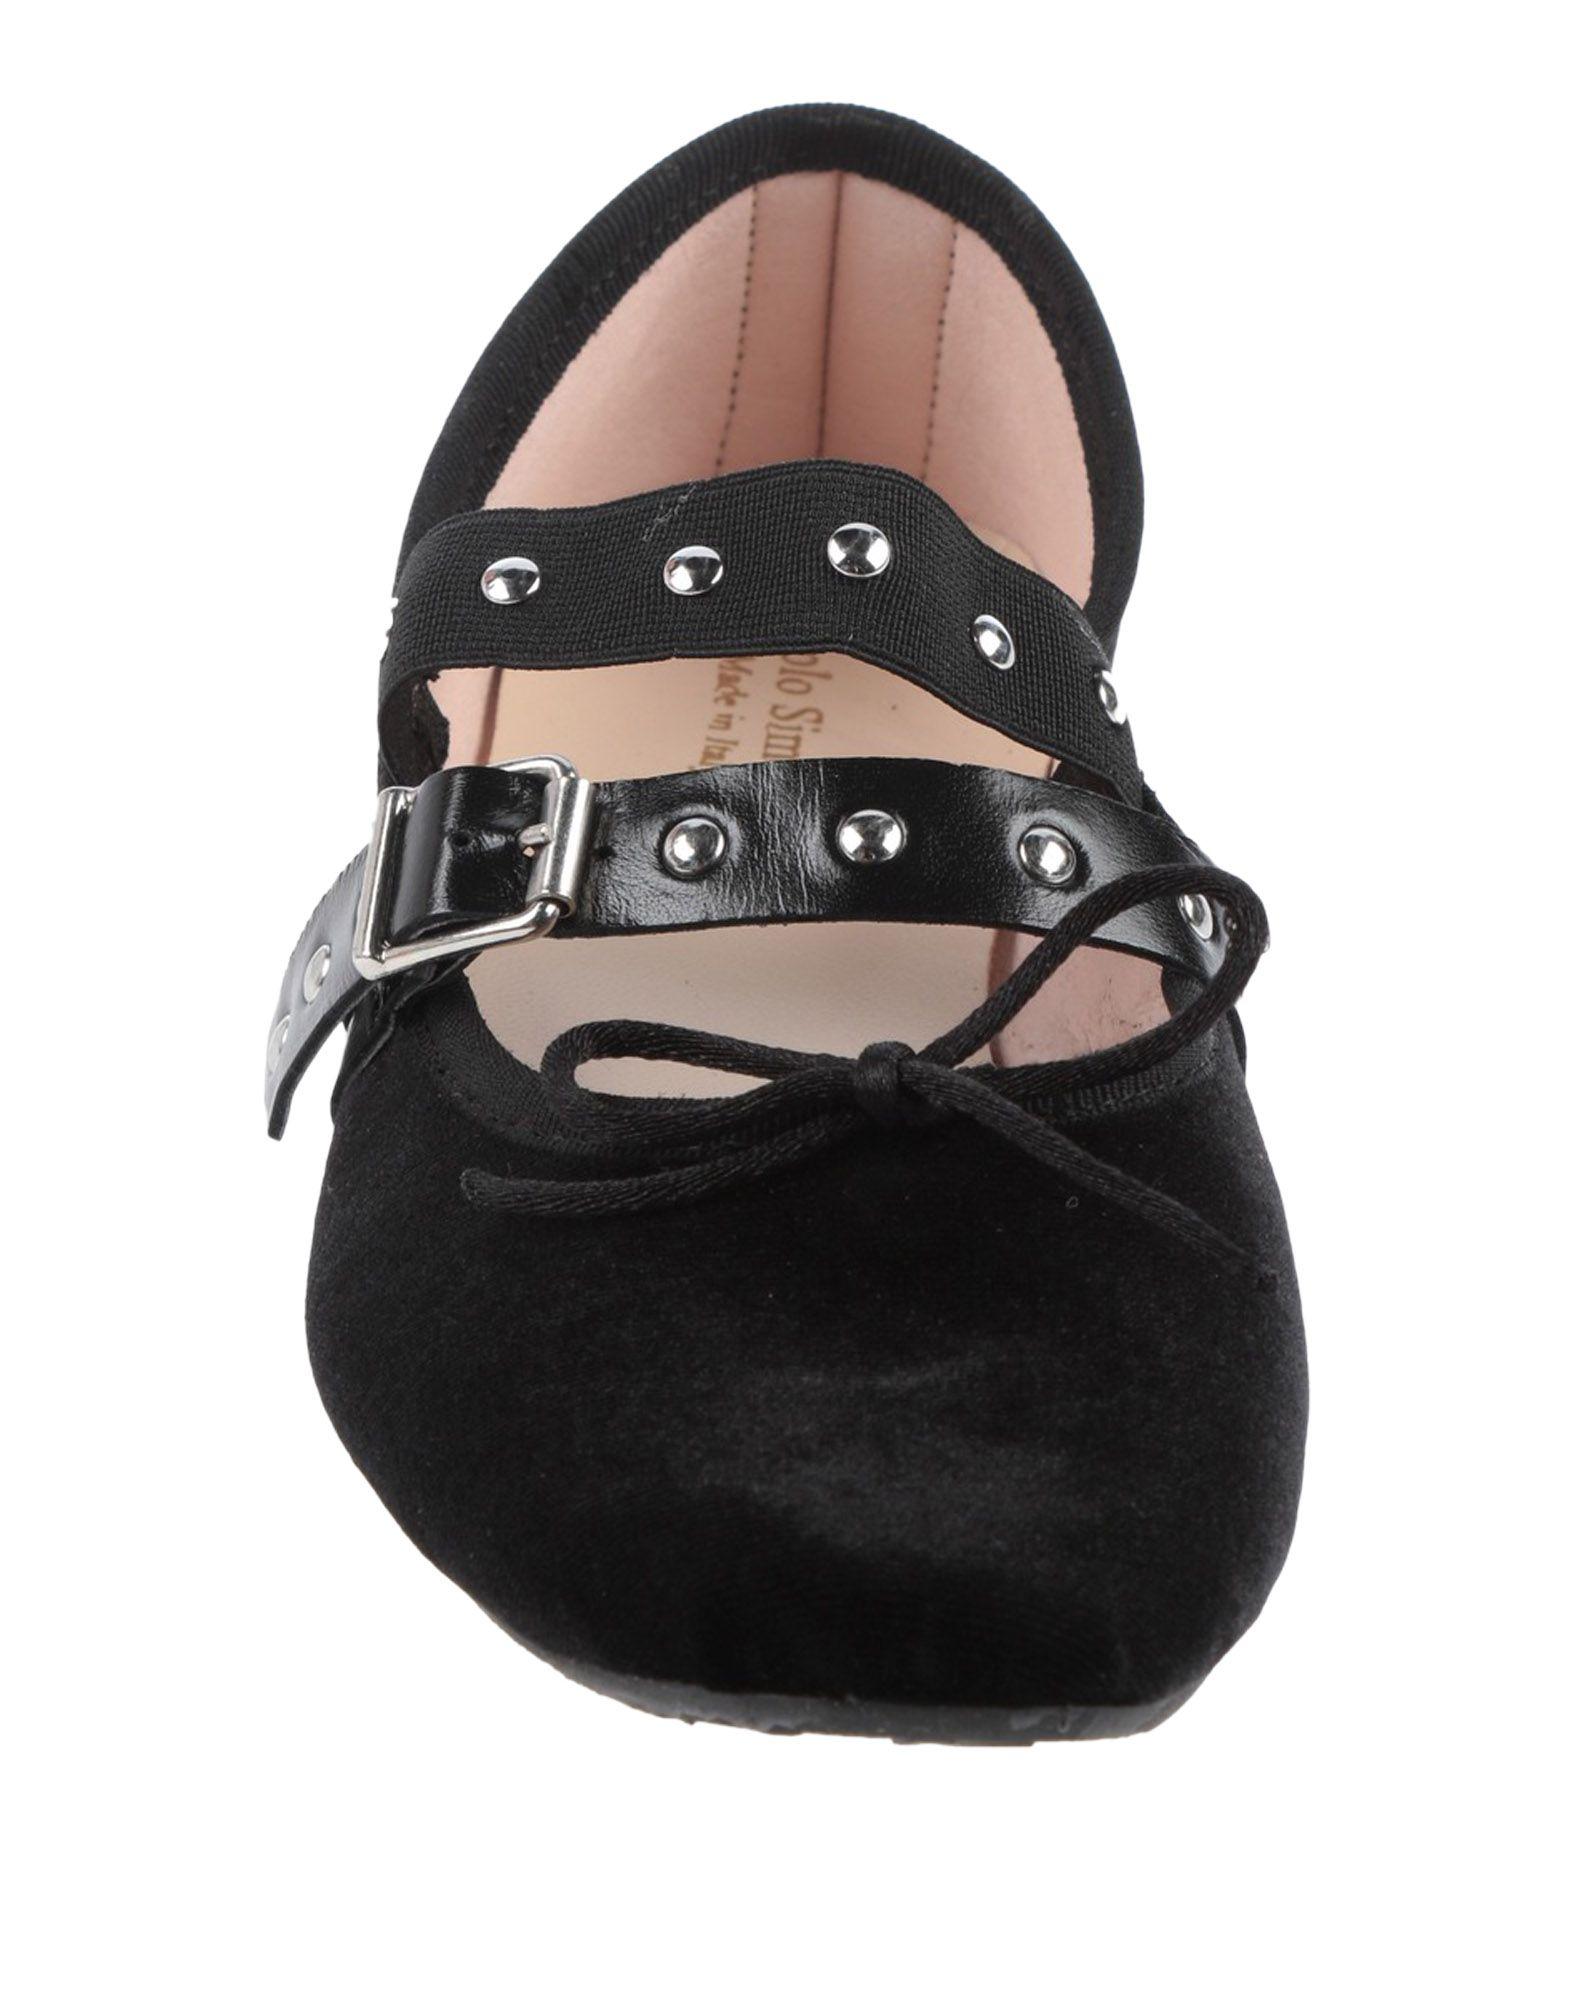 Gut um billige Schuhe Damen zu tragenPaolo Simonini Ballerinas Damen Schuhe  11518475TX d75727